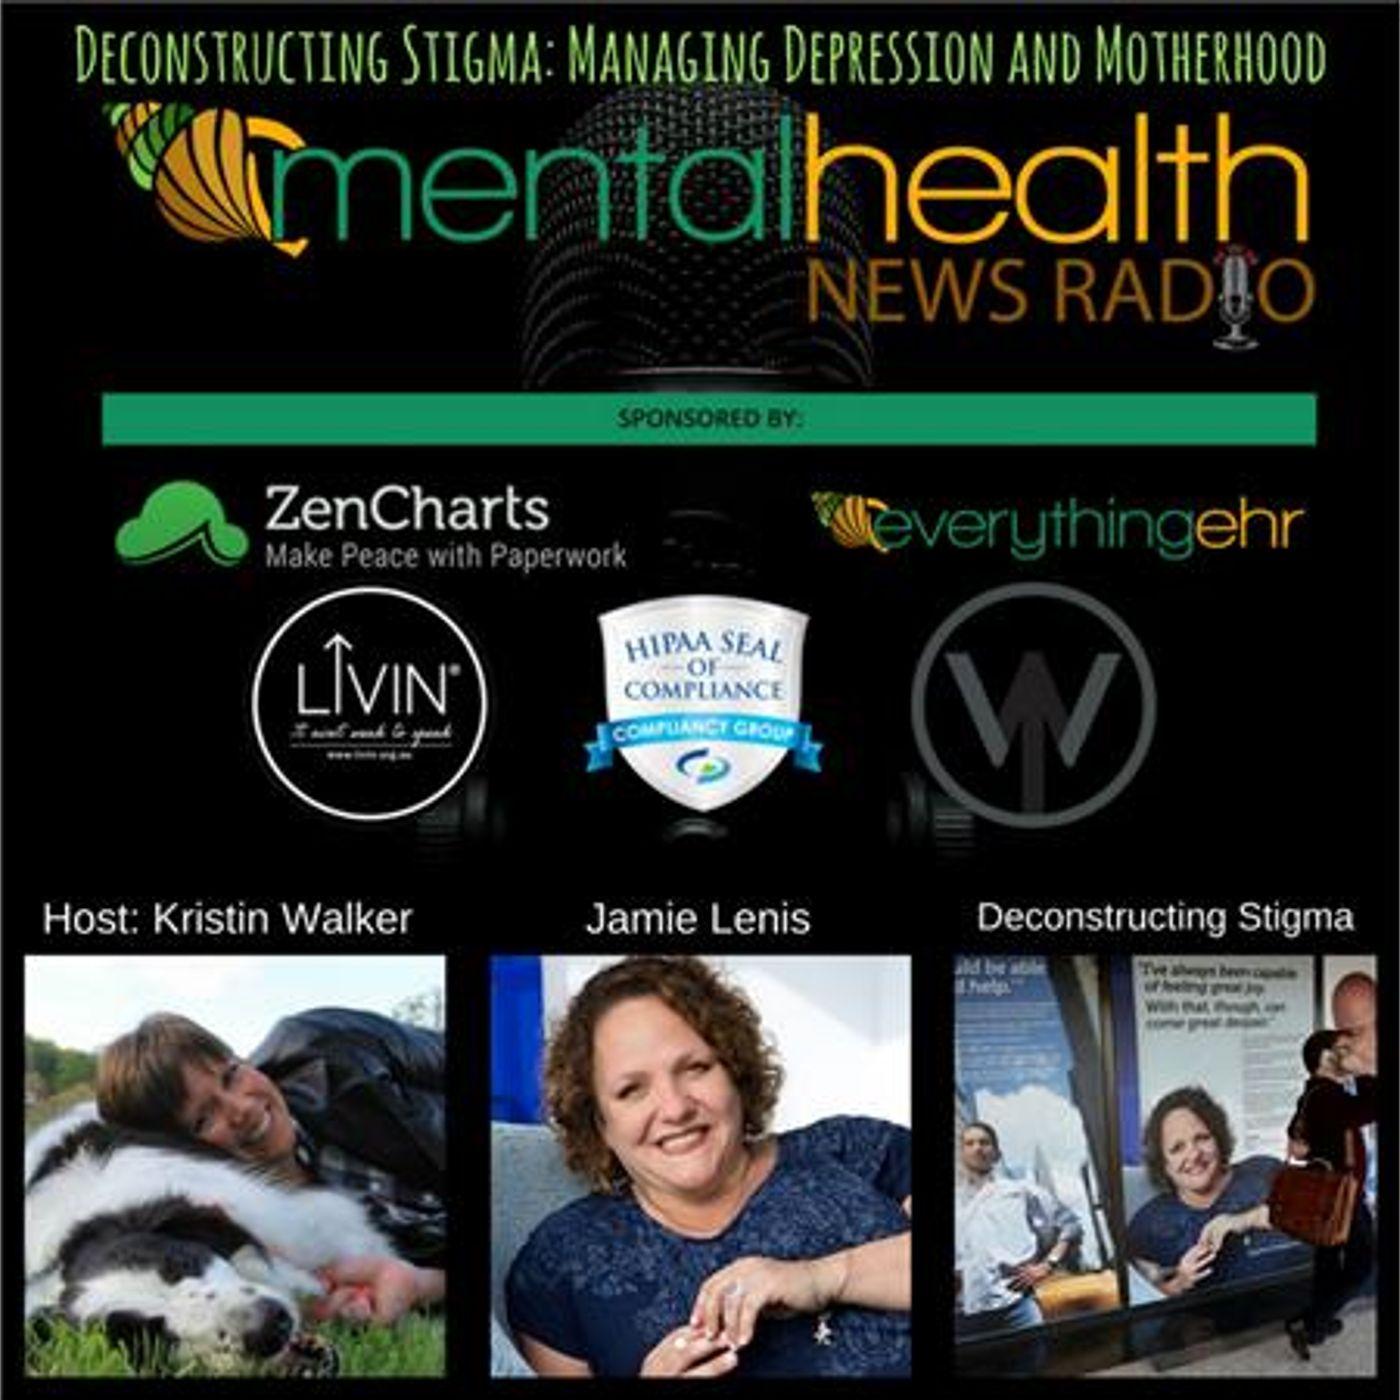 Mental Health News Radio - Deconstructing Stigma: Jamie Lenis on Managing Depression and Motherhood